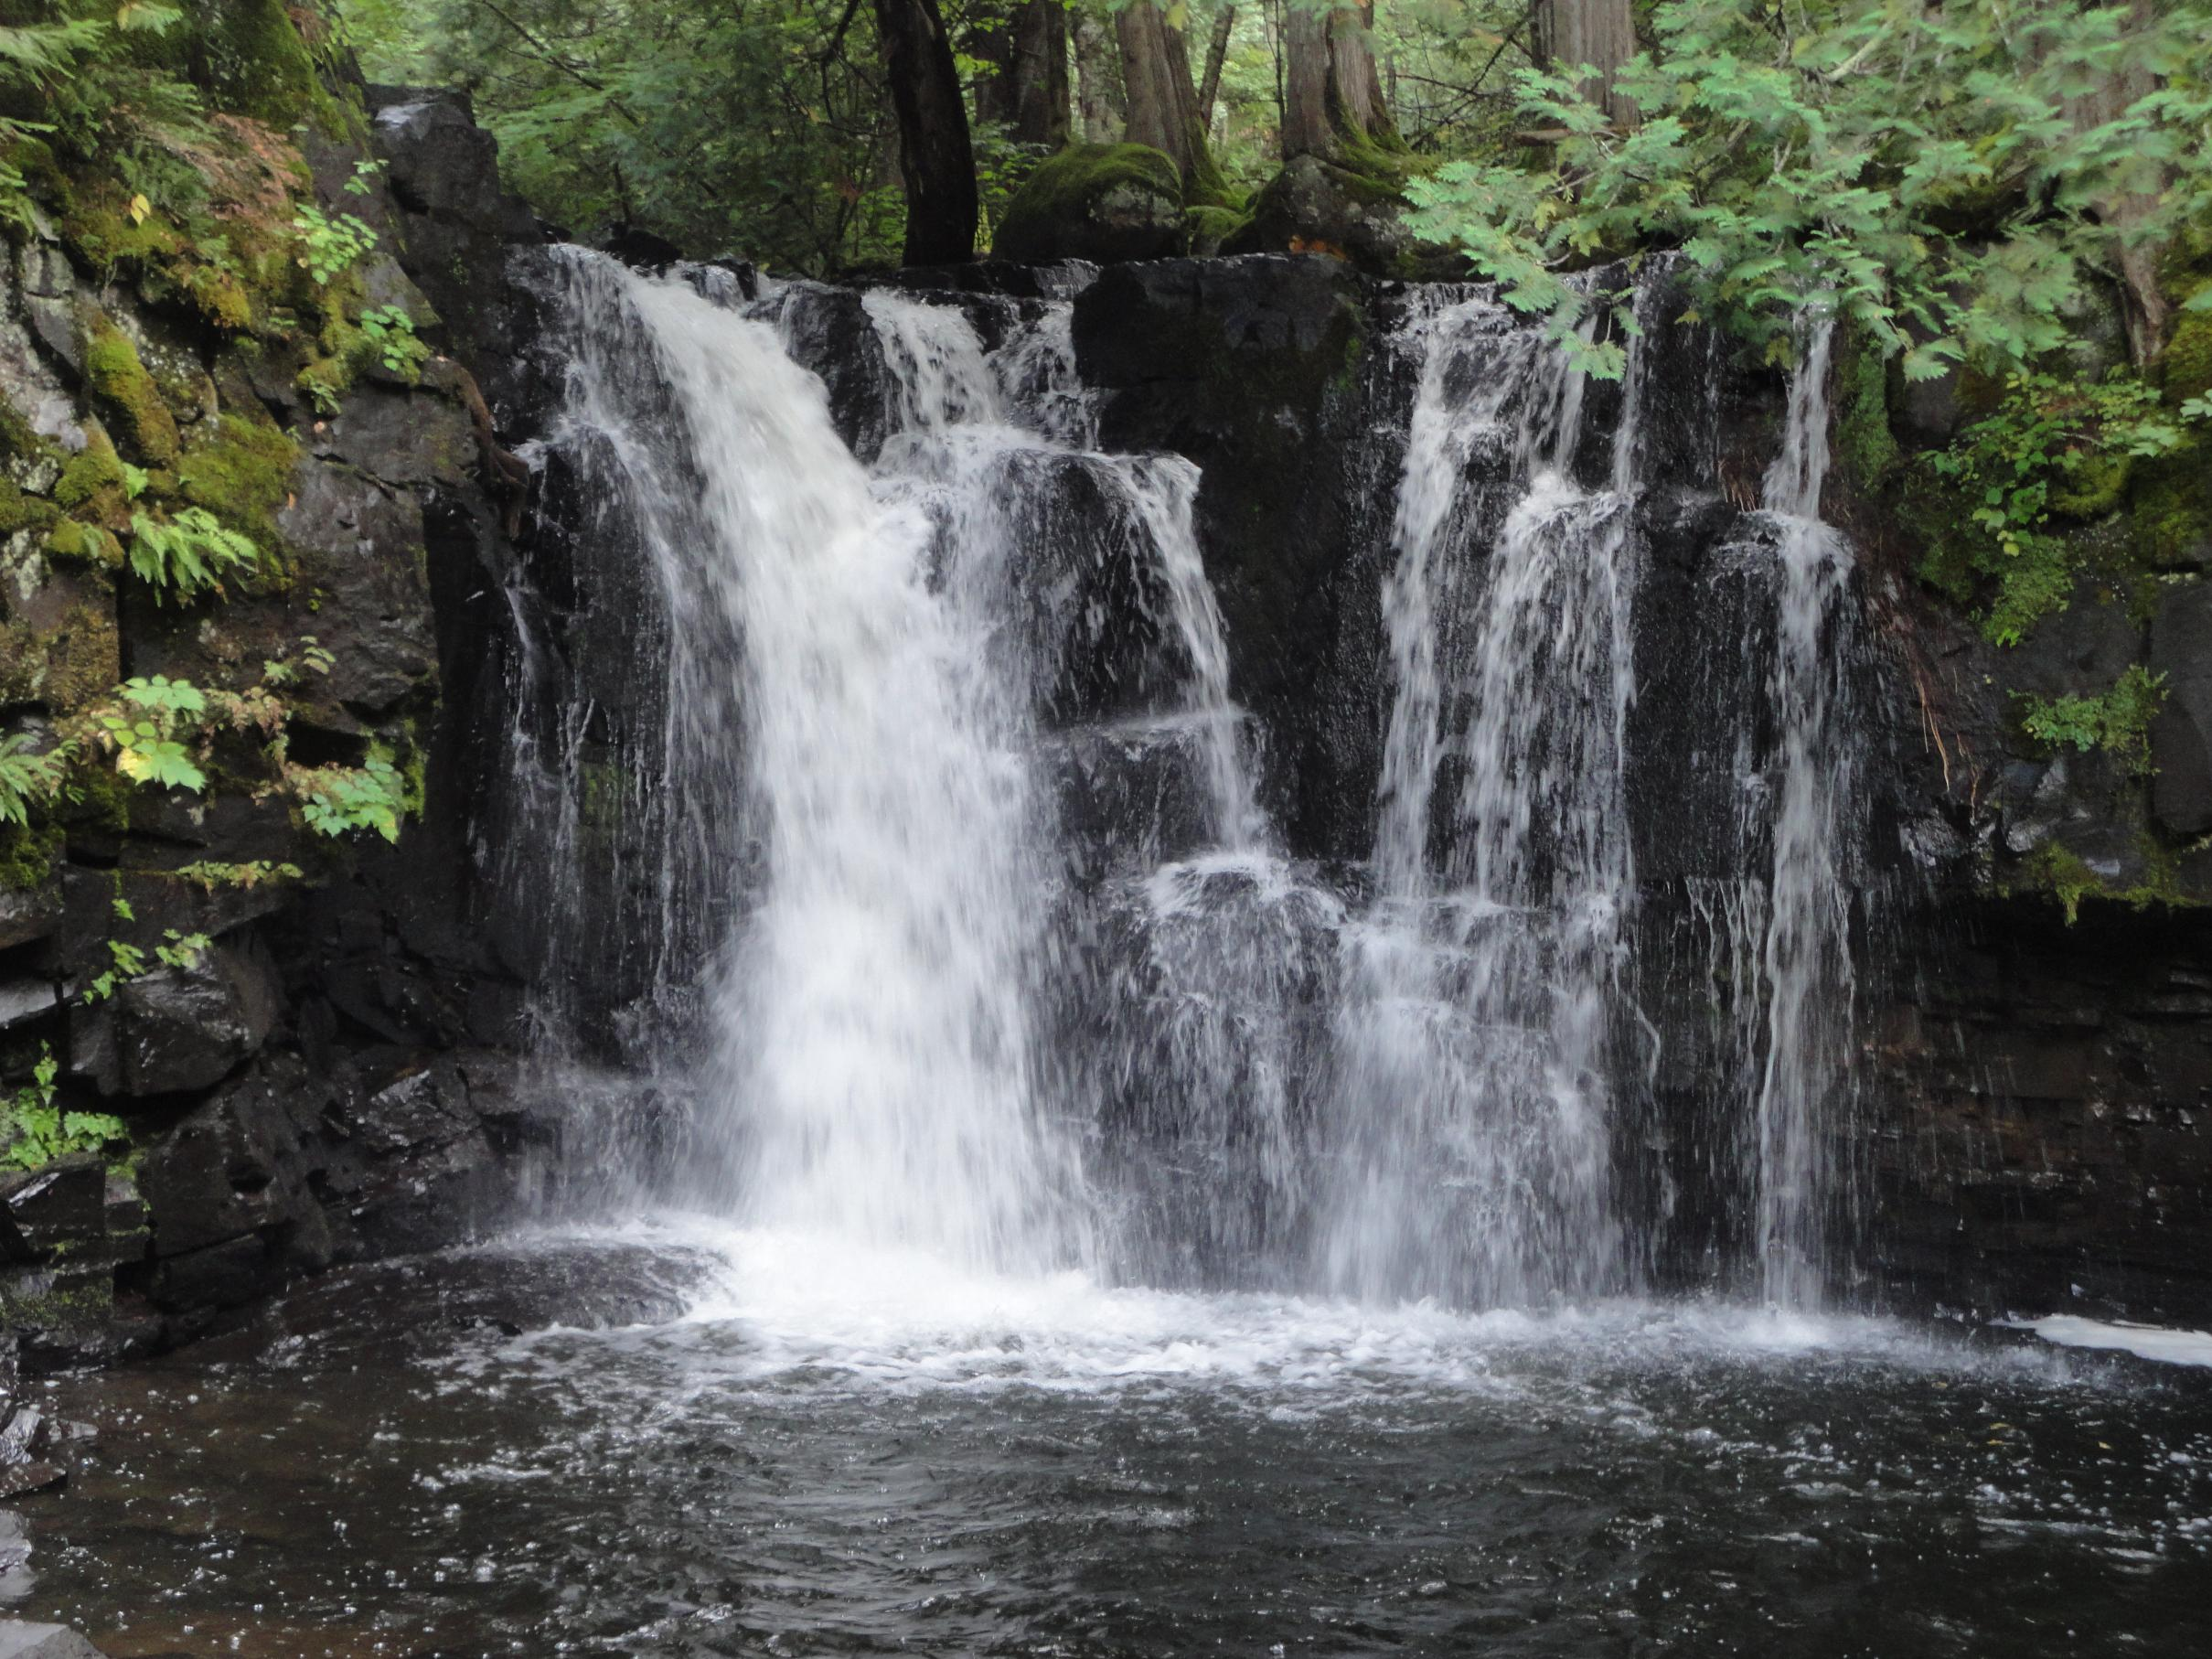 Lower Johnson Falls